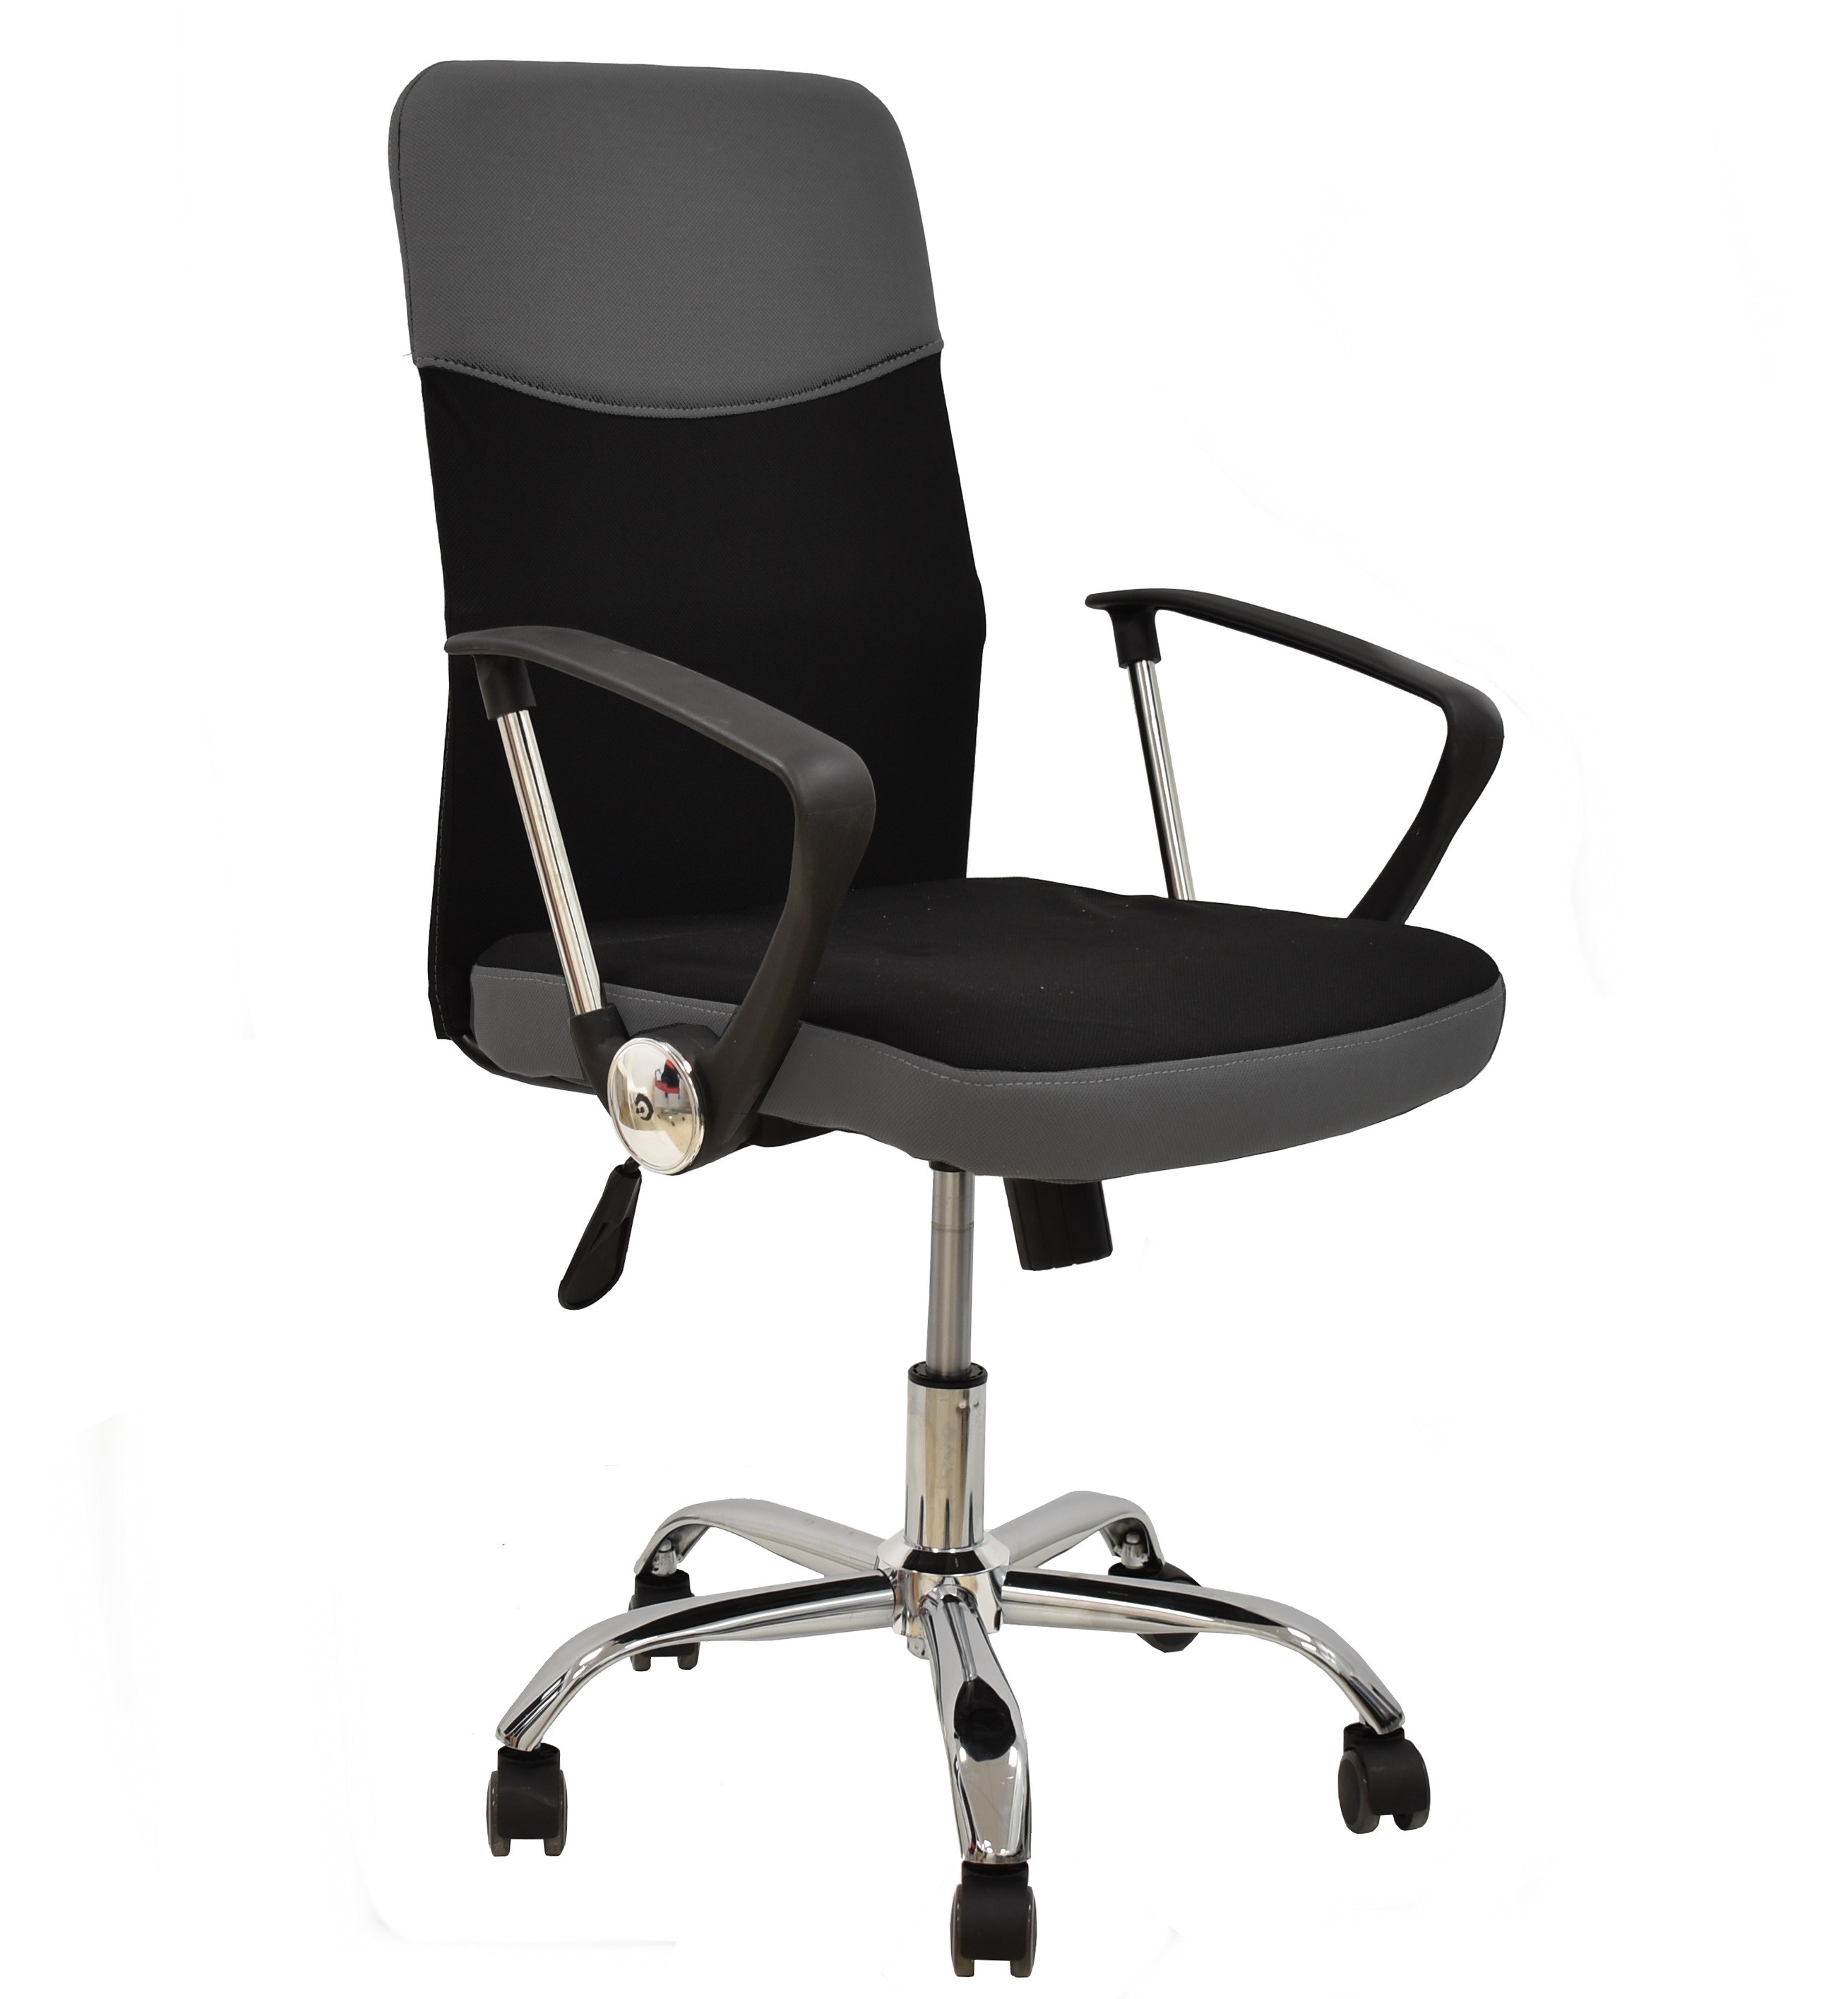 Office Armchair TANGO, Gas, Tilt, Fabric Black Gray